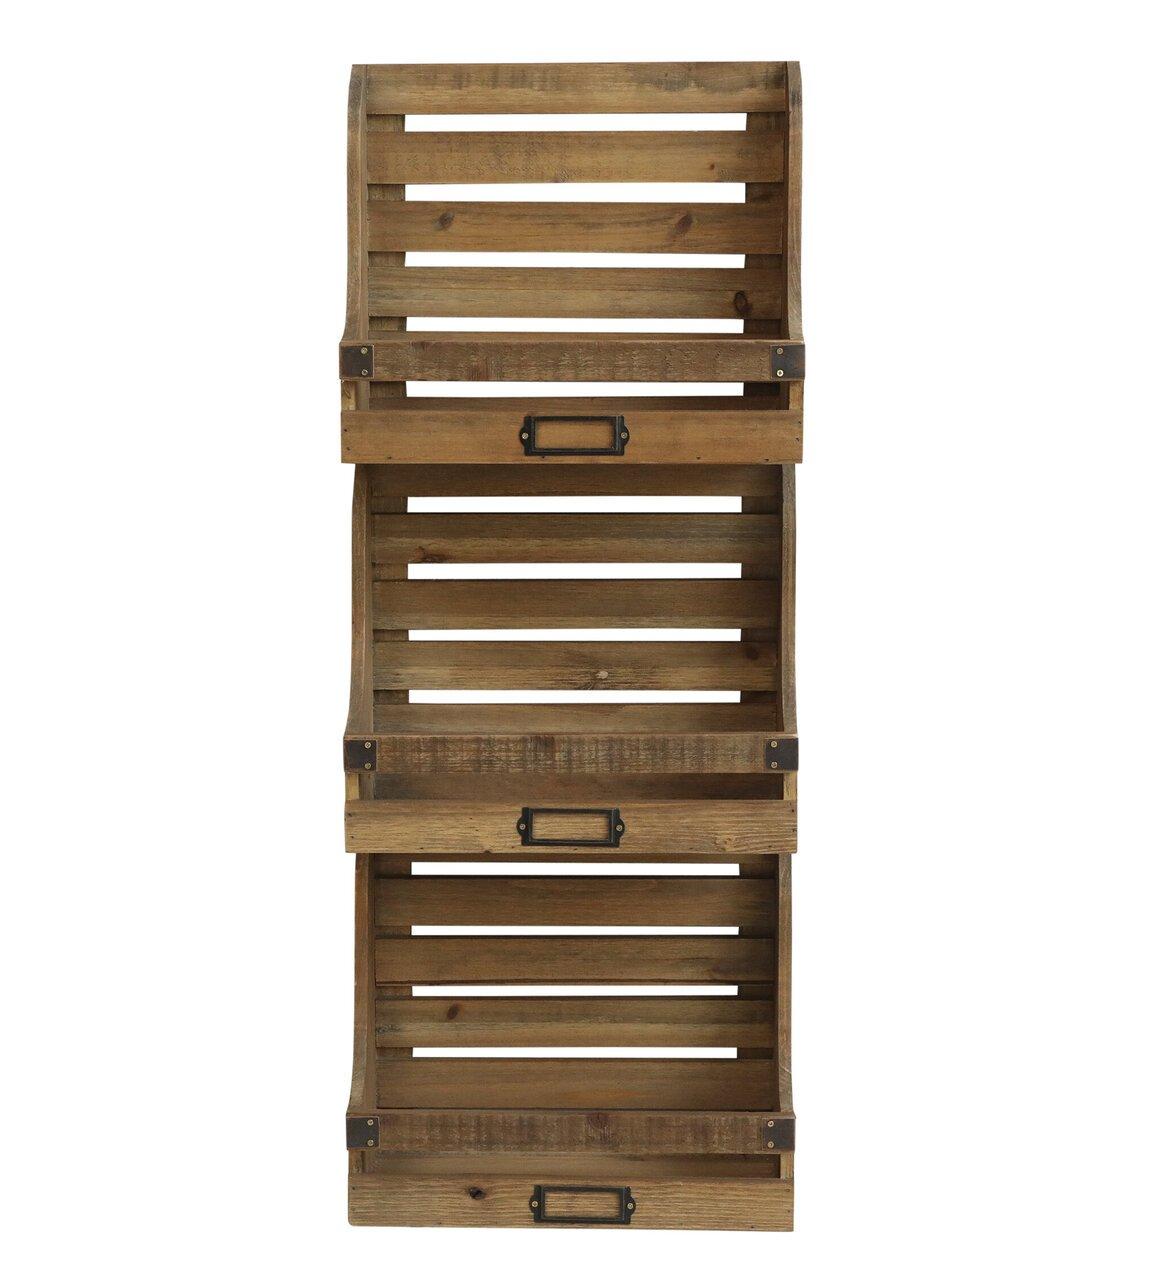 Chic Antique Magazinhalter aus Holz